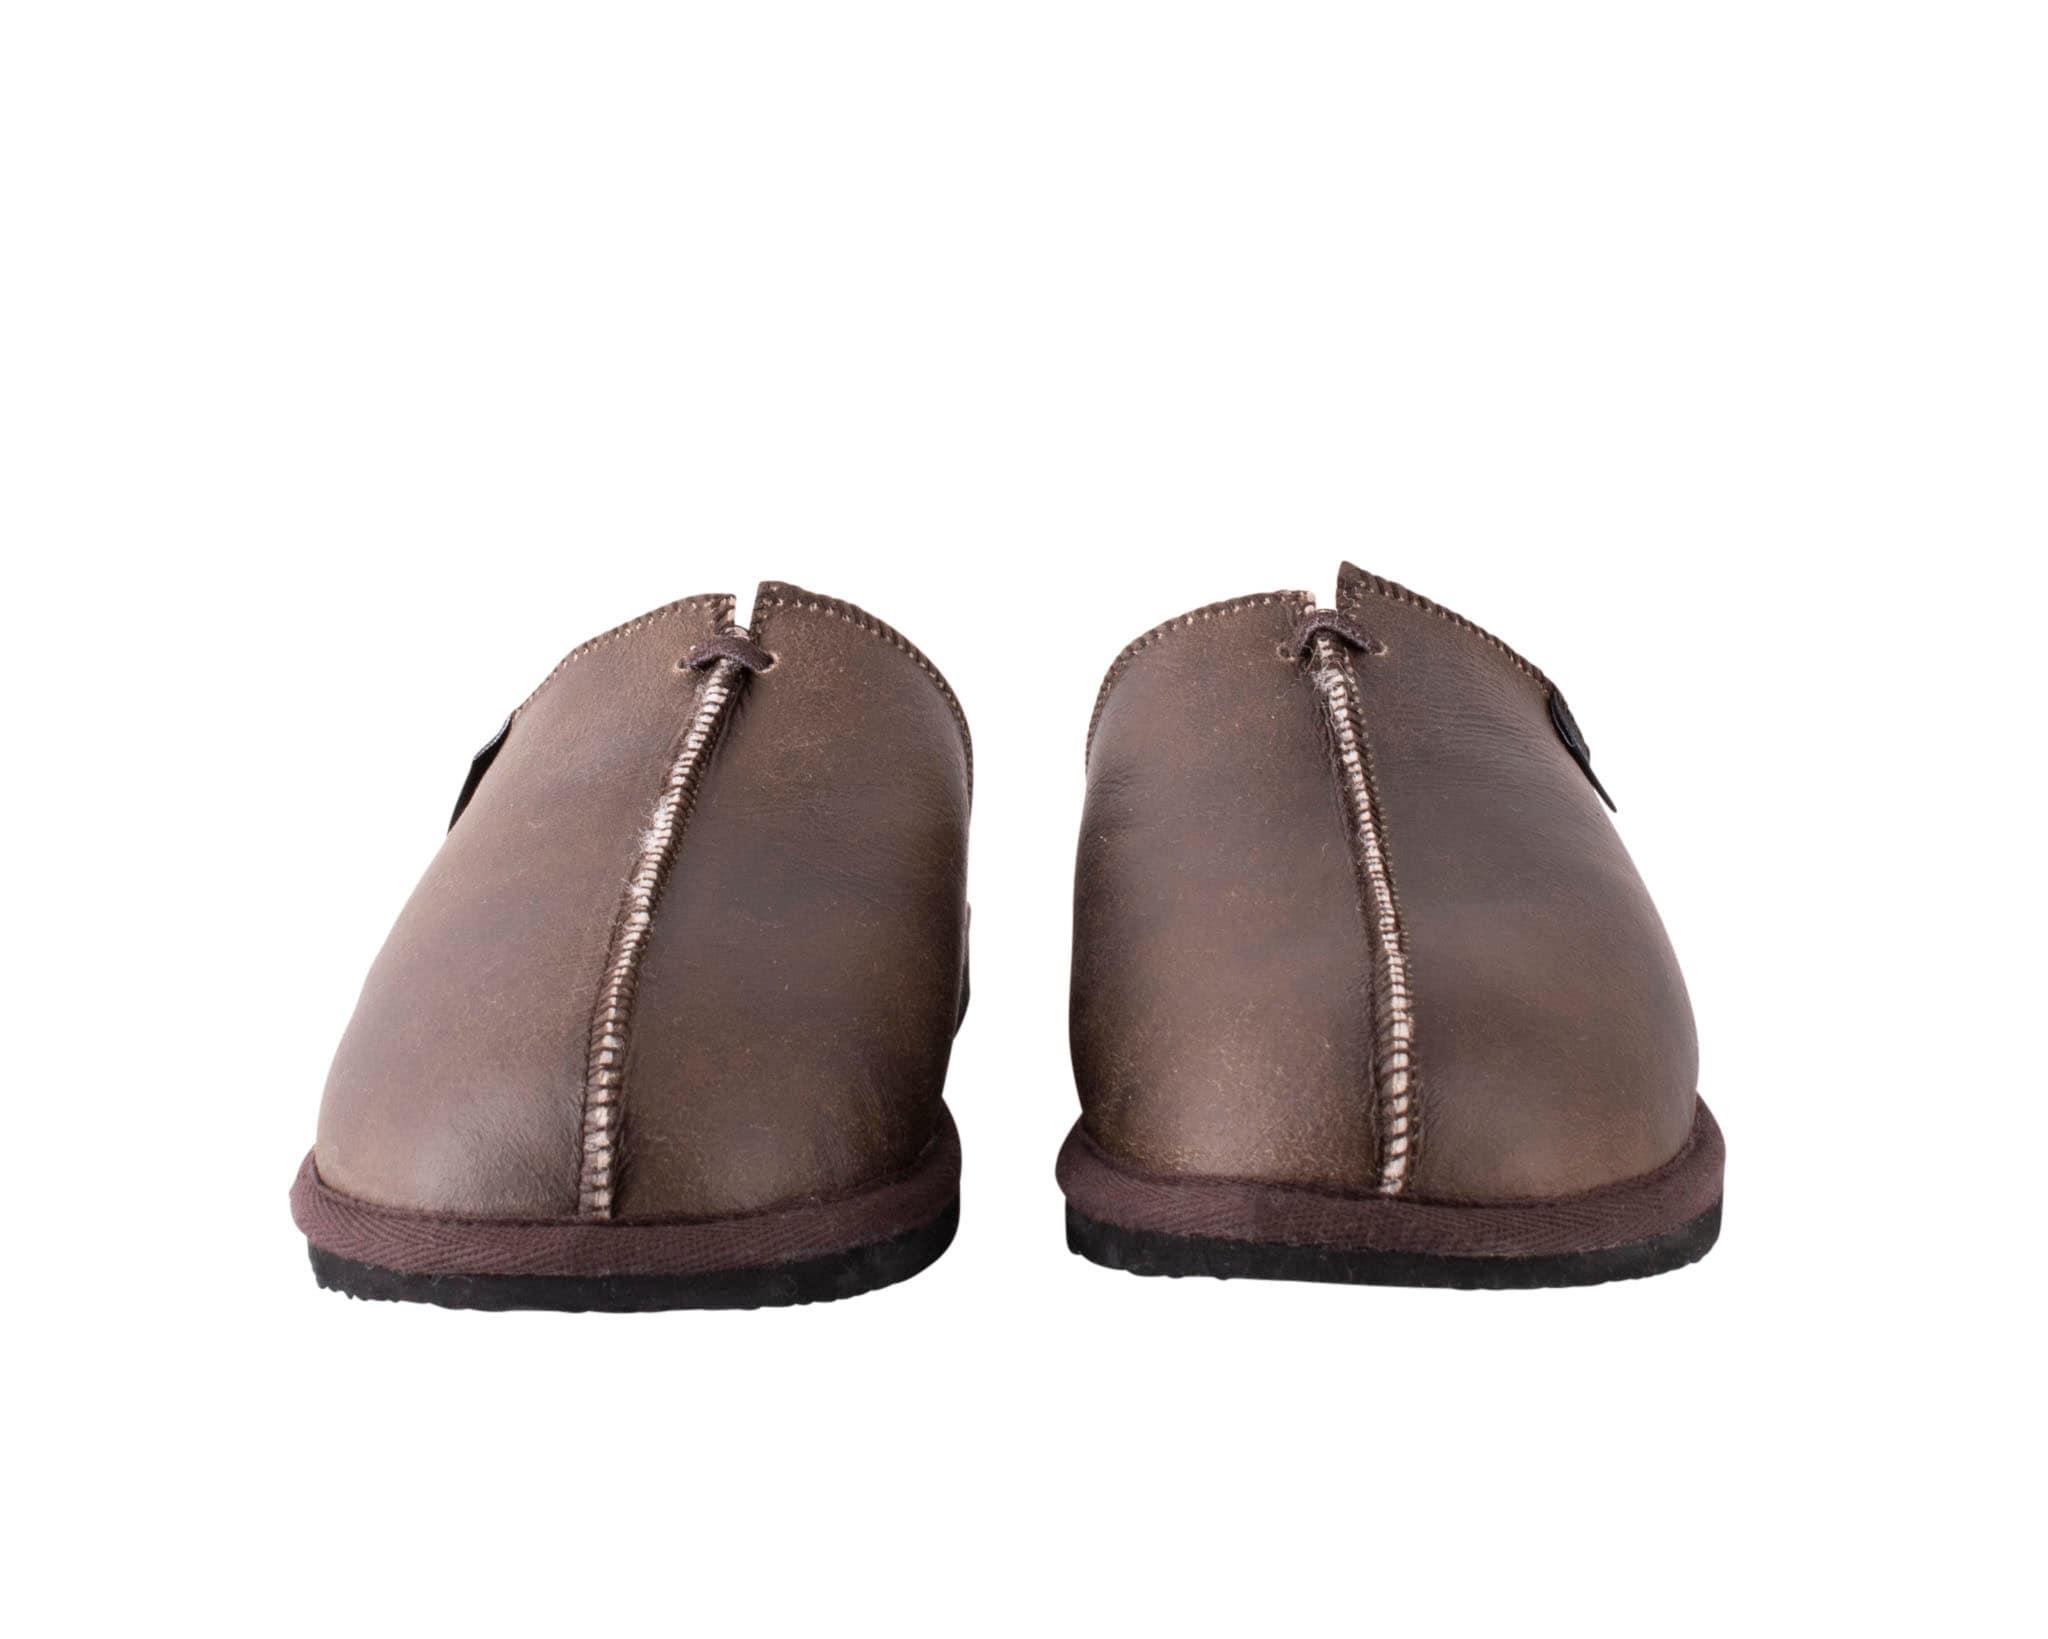 Hugo slippers Oiled antique